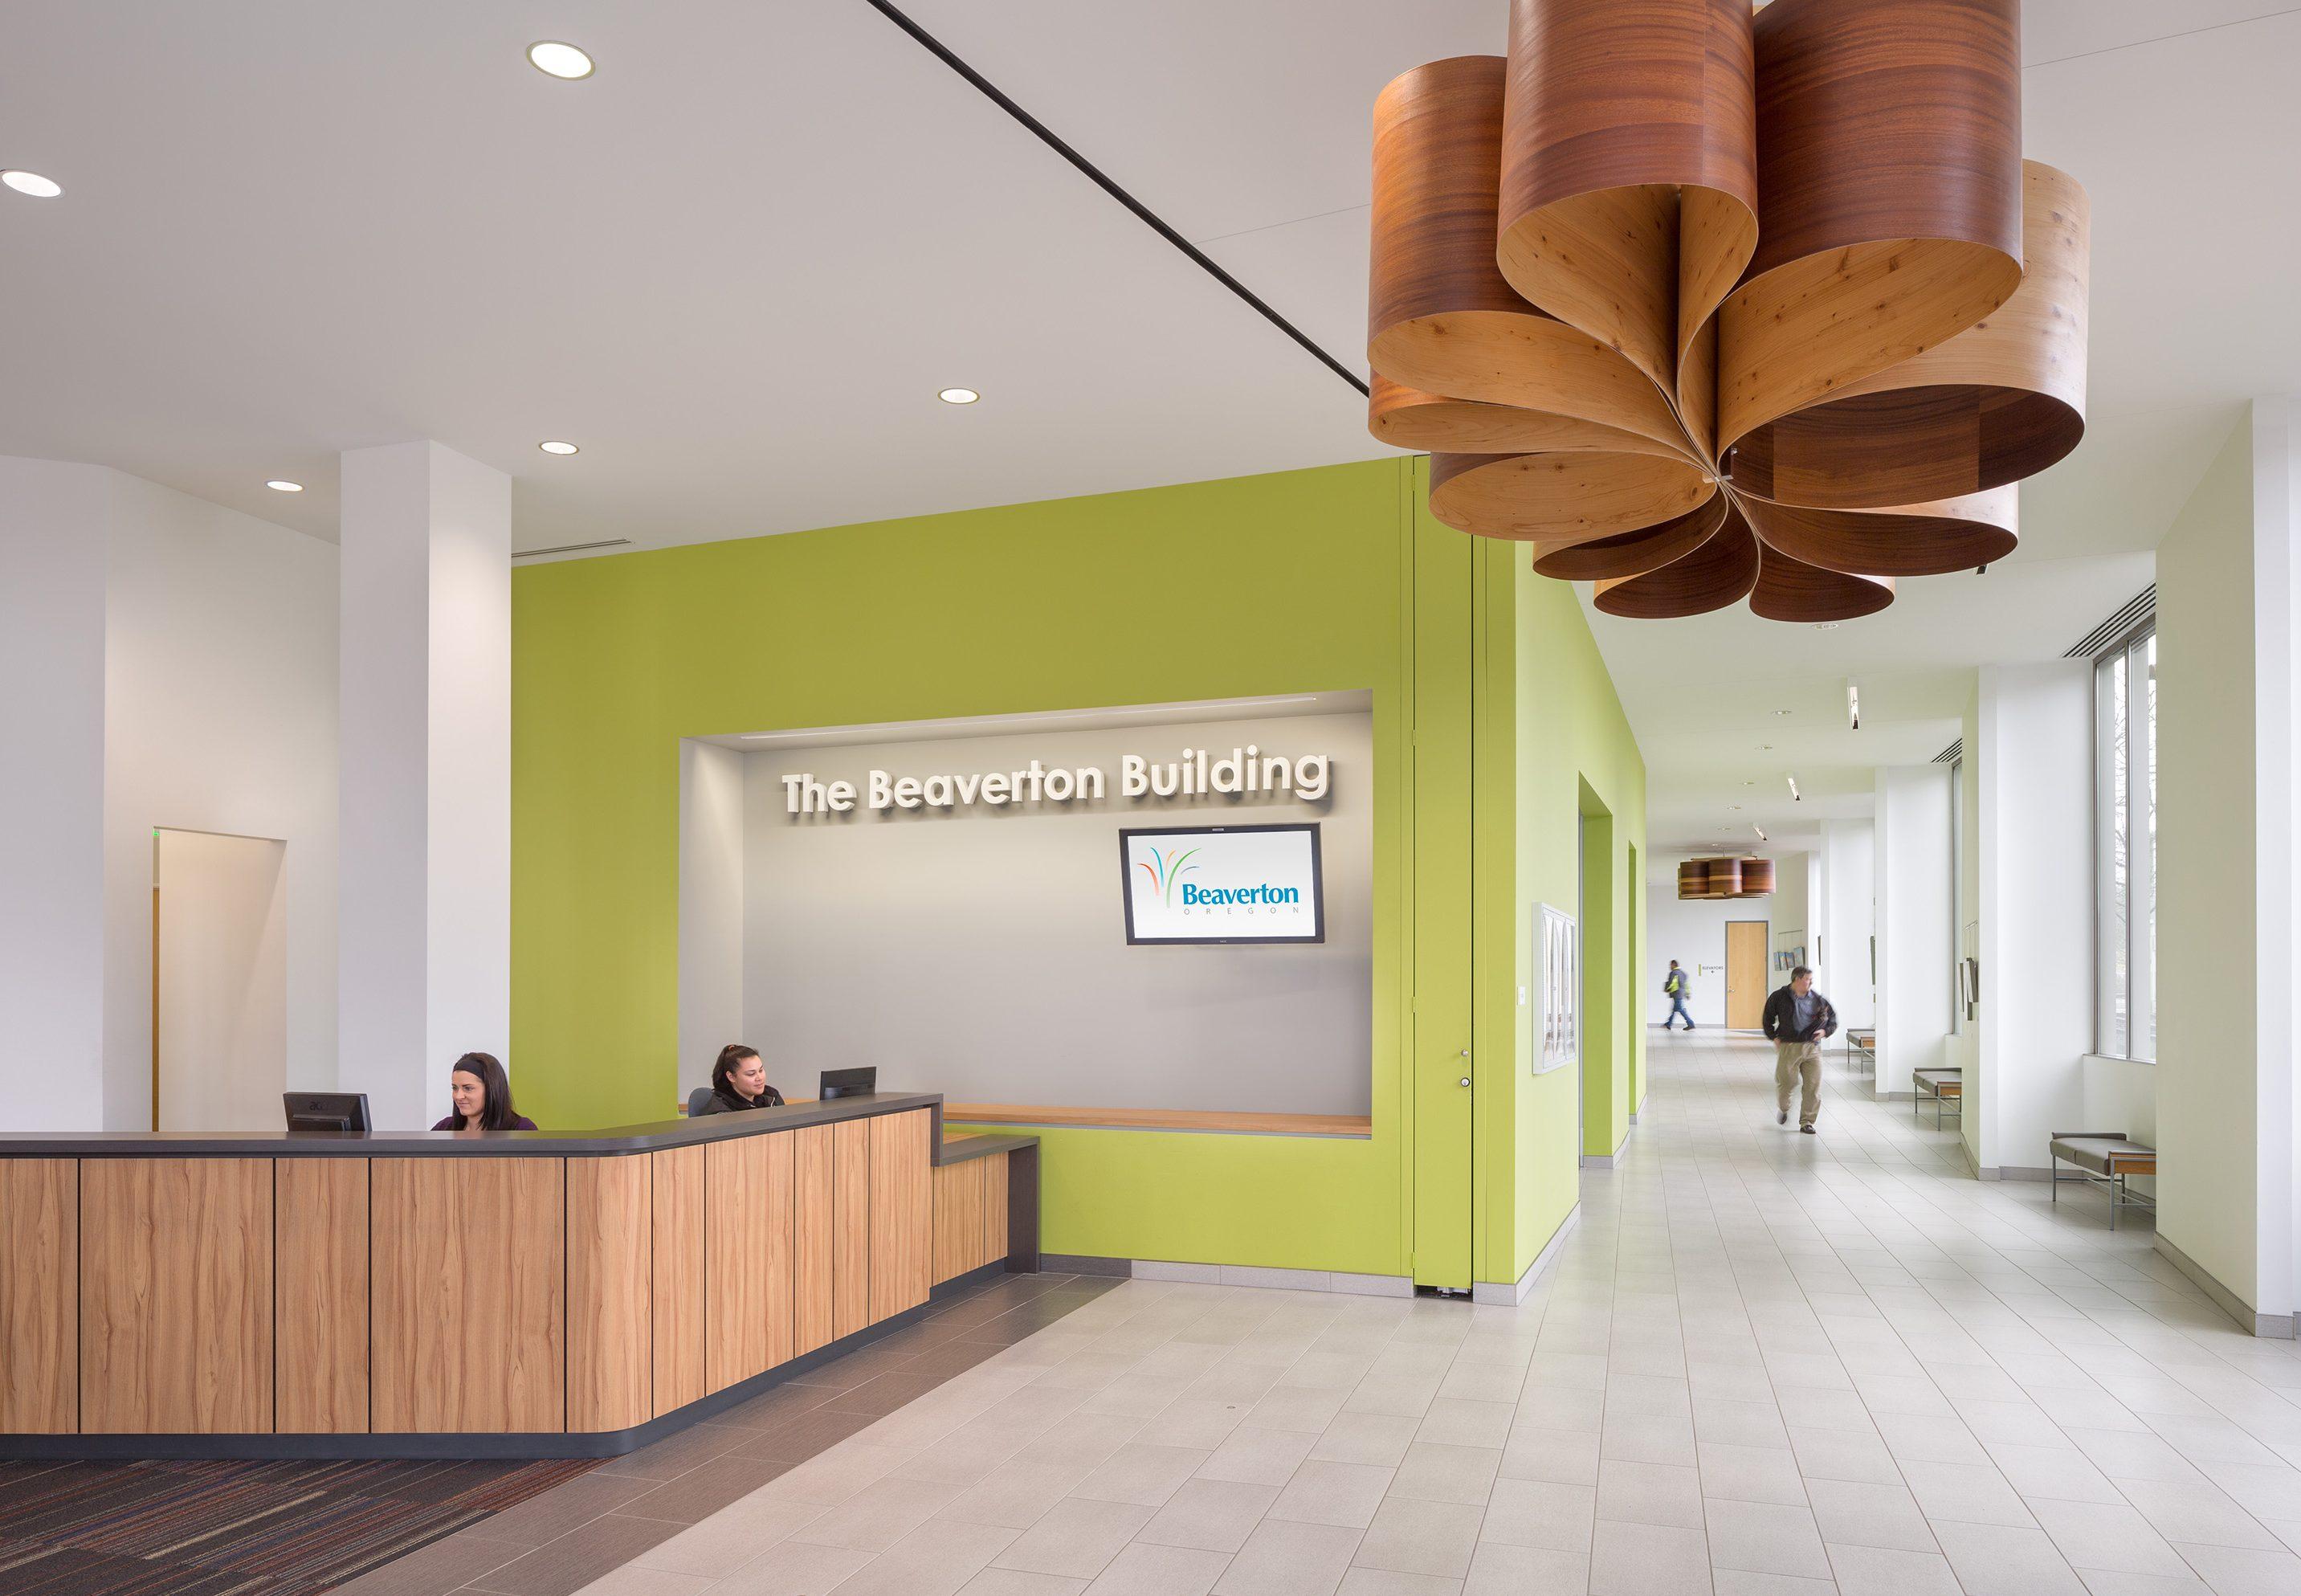 Beaverton City Hall administration building renovation